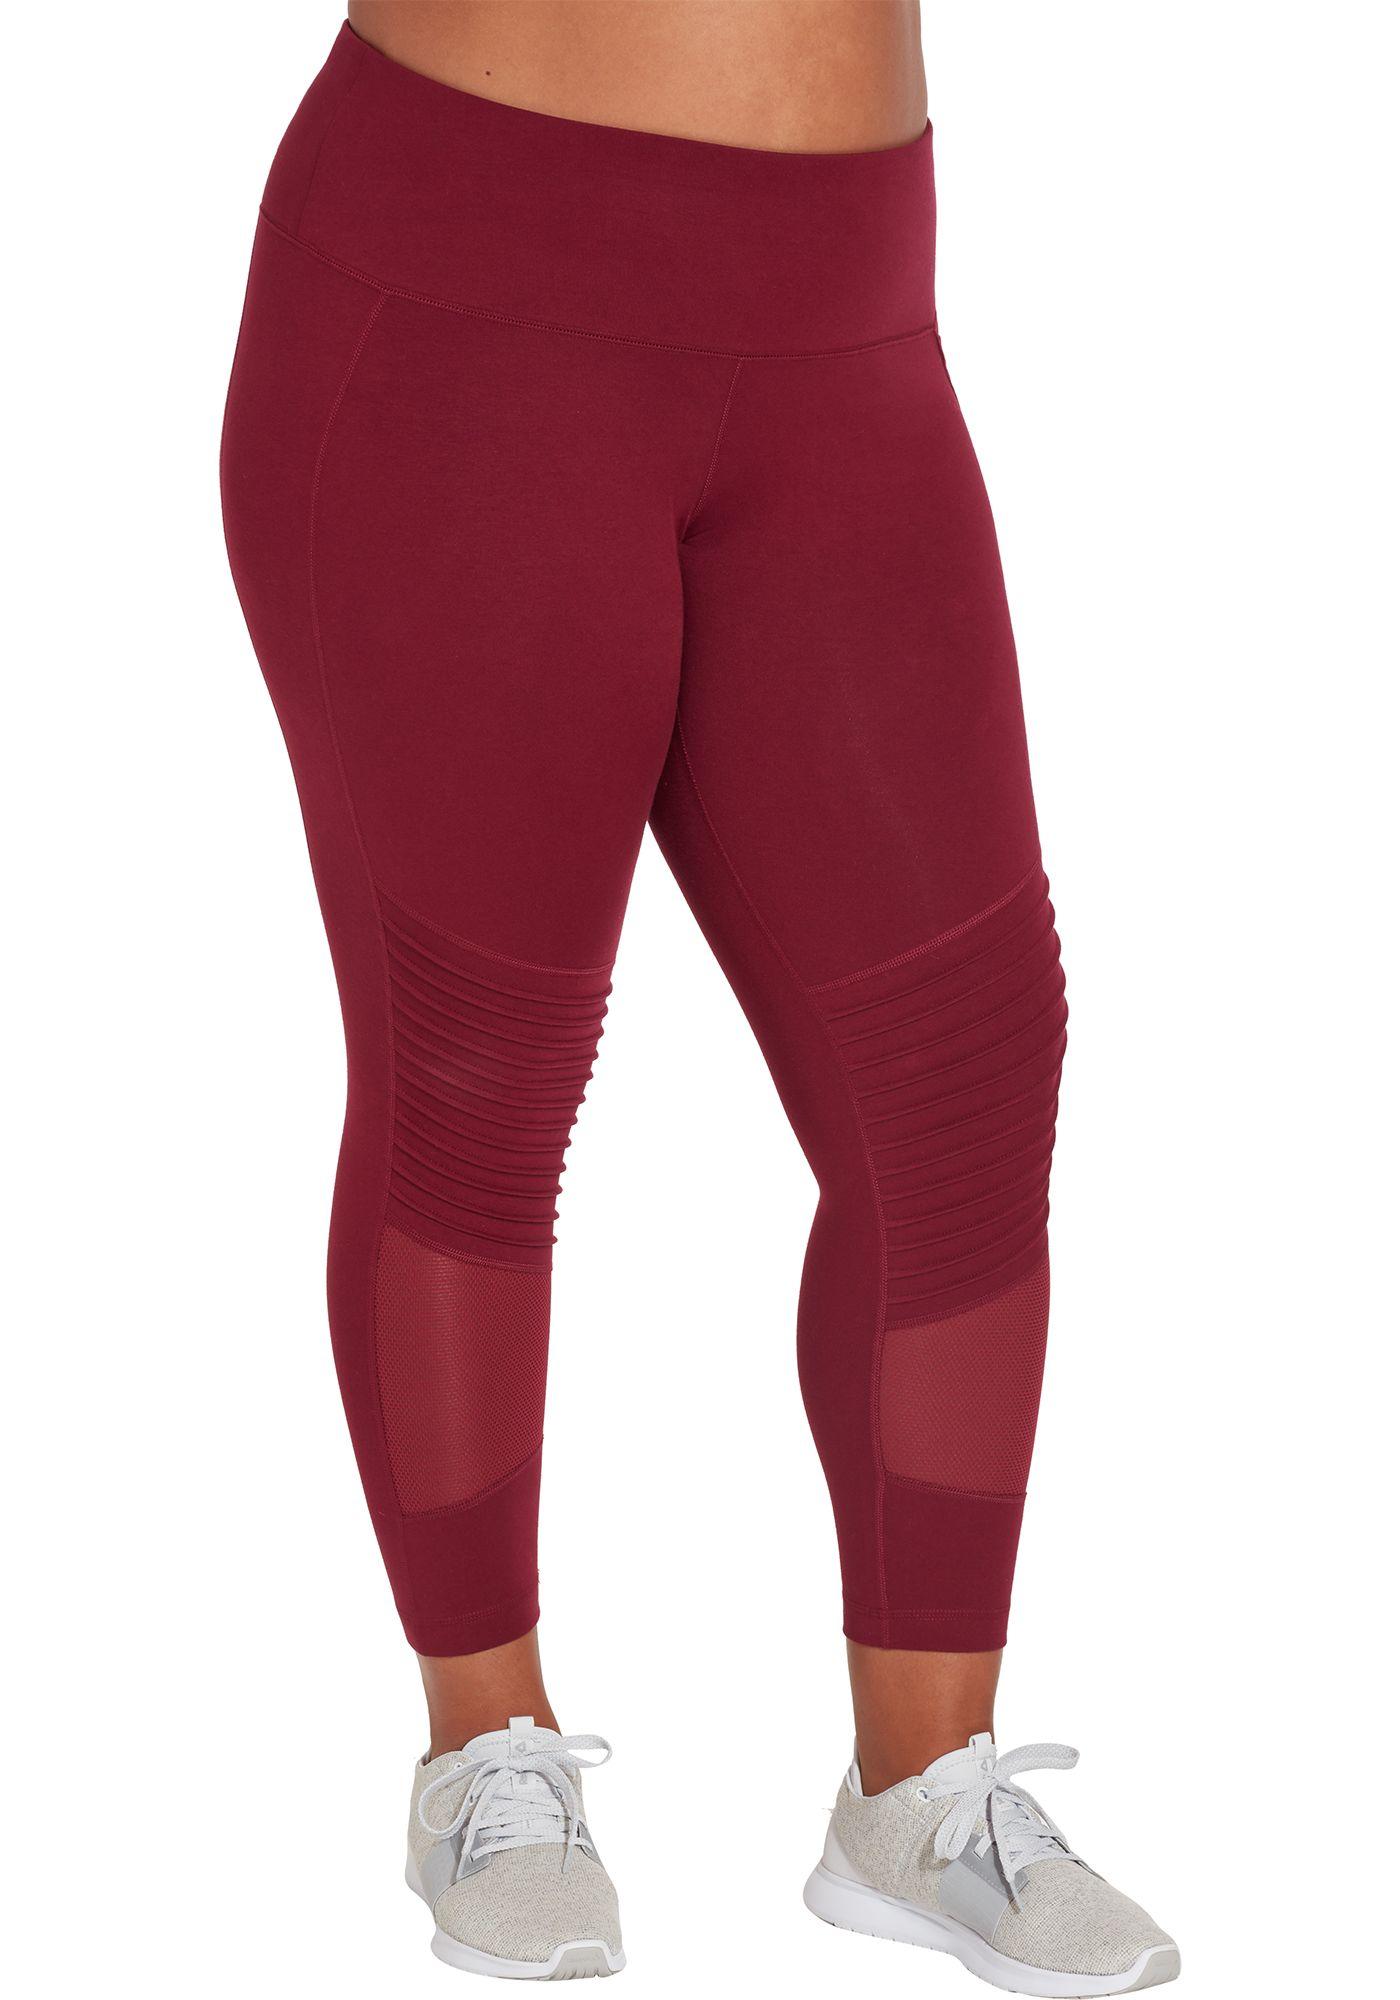 Reebok Women's Plus Size Stretch Cotton Moto Tights